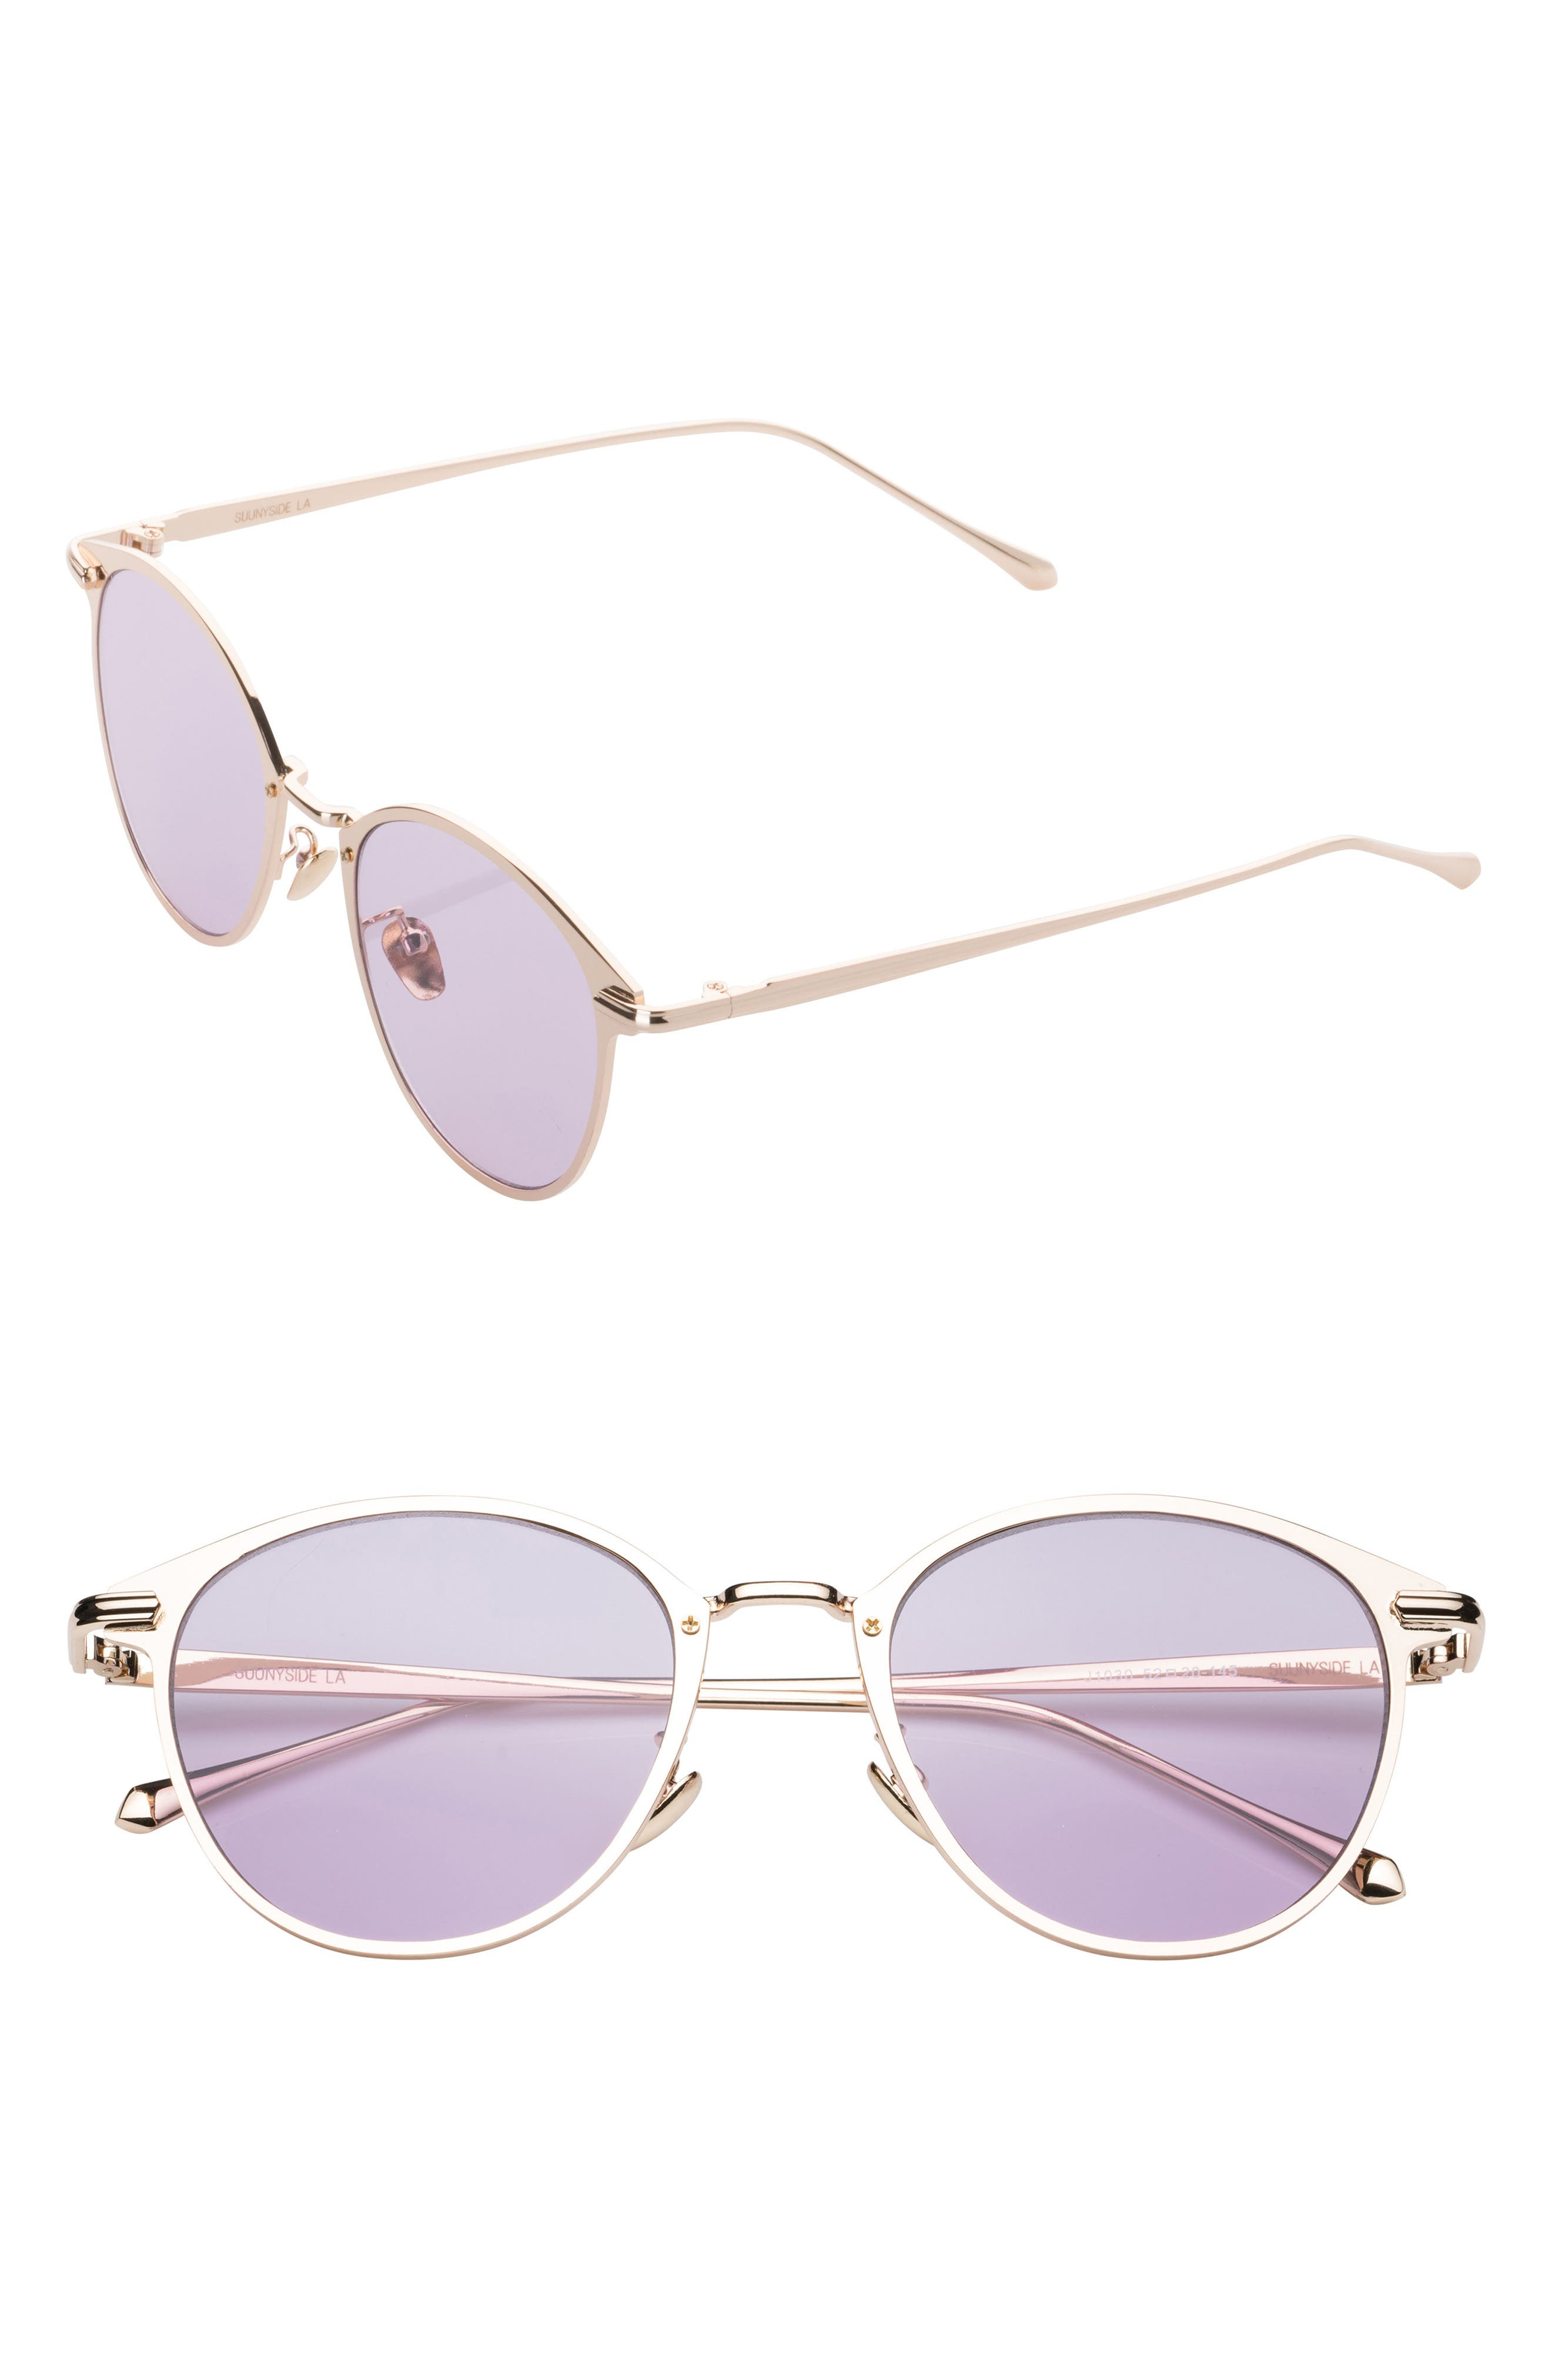 SunnySide LA 51mm Oxford Sunglasses